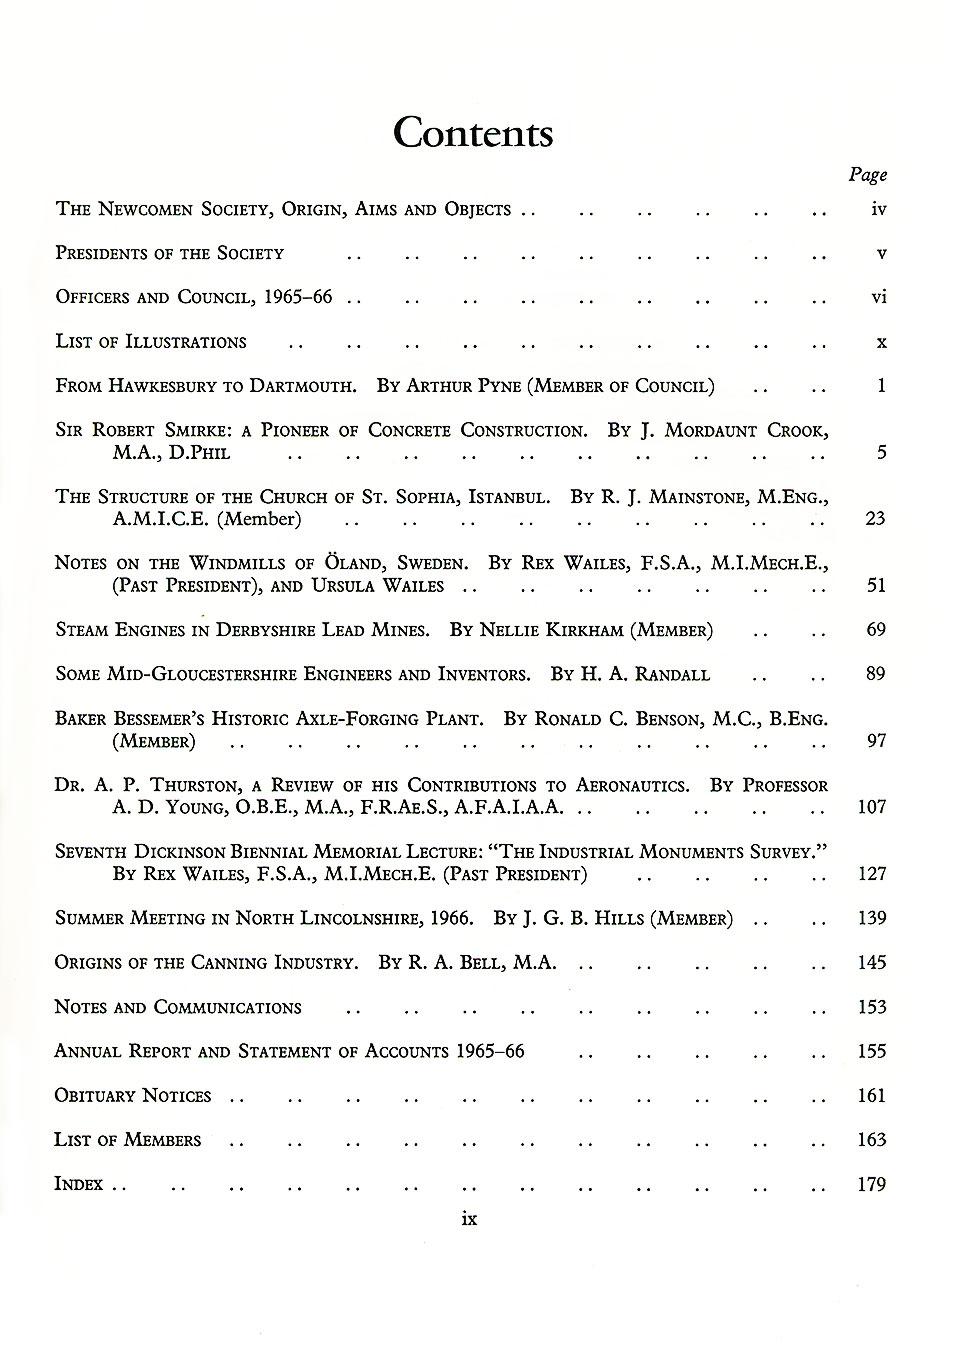 The Journal - V38 No1 1965-66 - contents Hardback